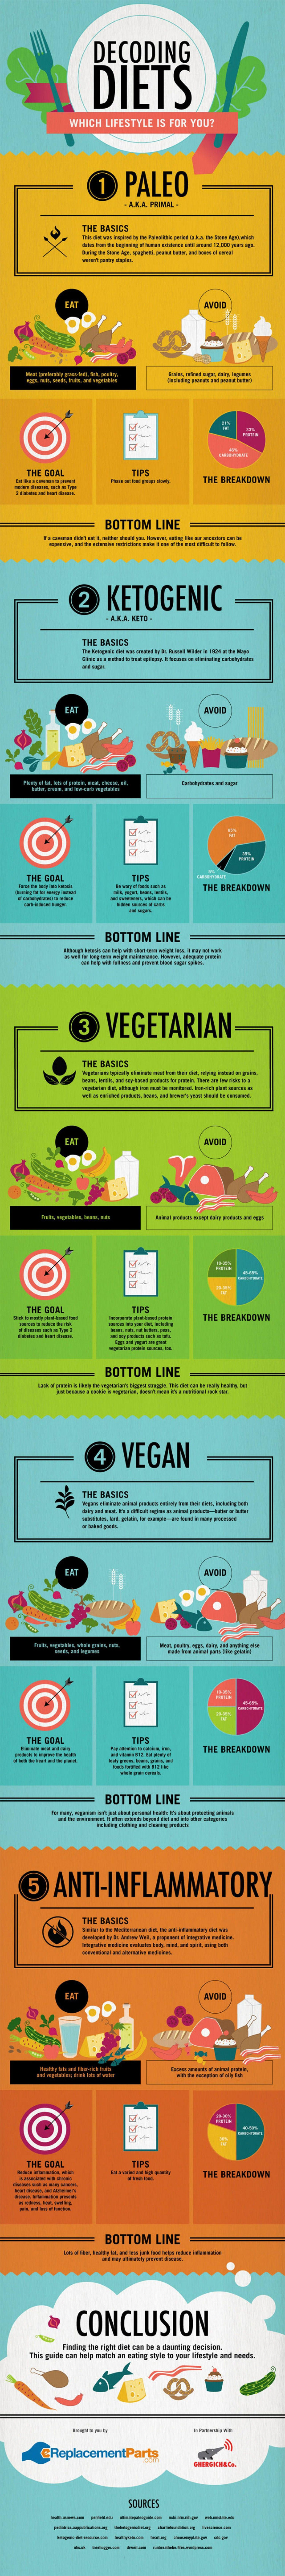 Caveman diet meal plan pdf